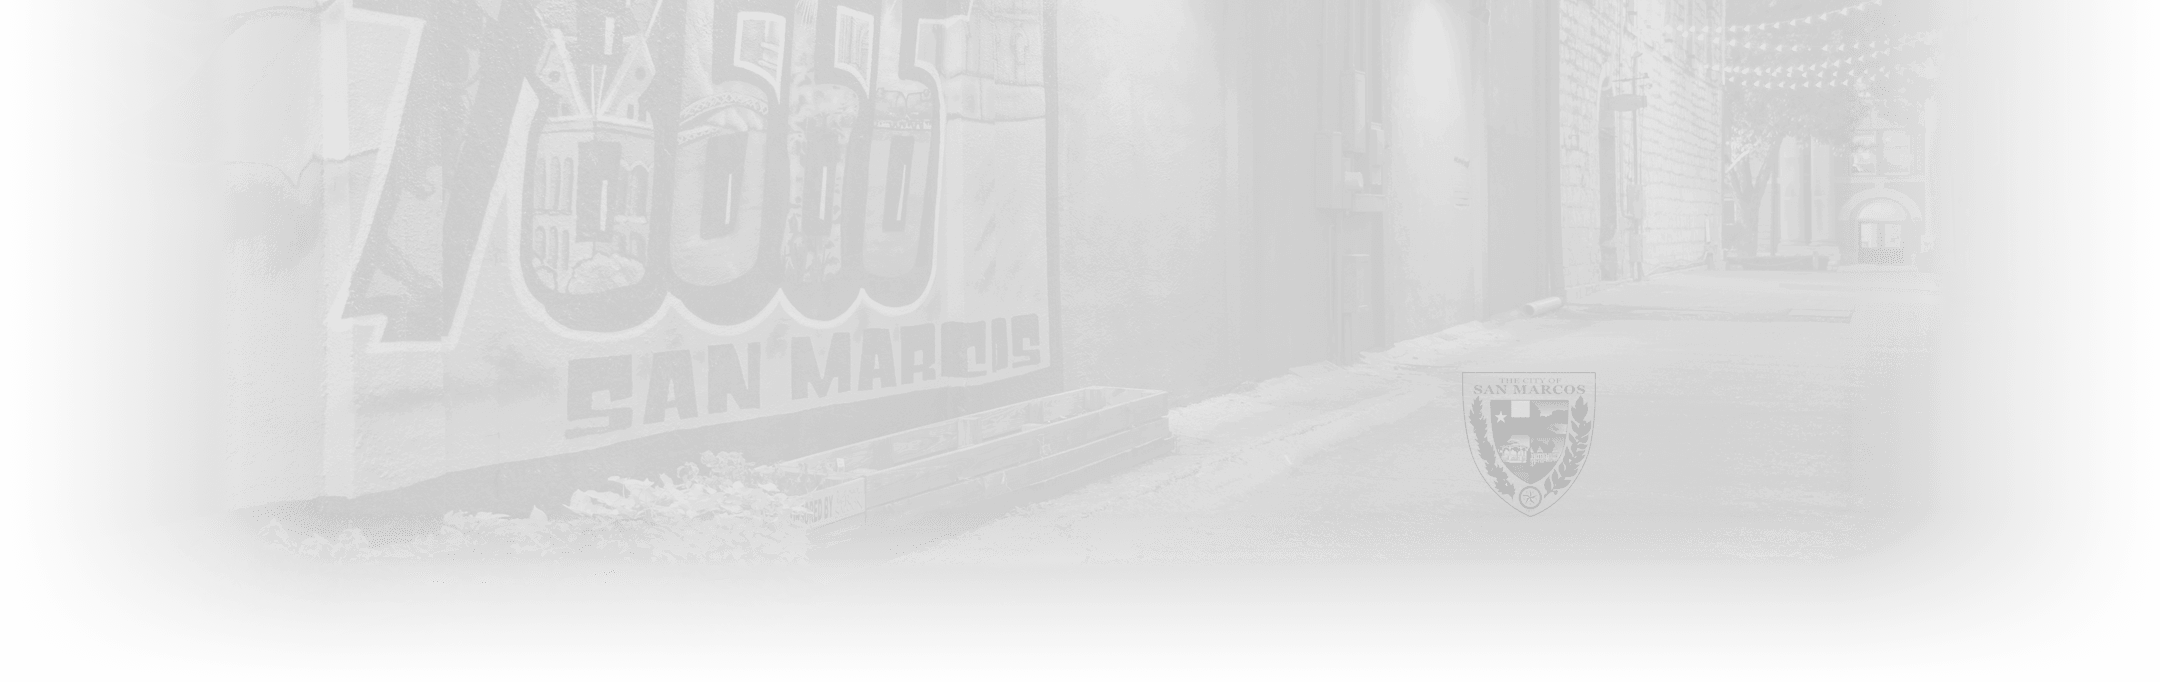 City Of San Marcos Tx